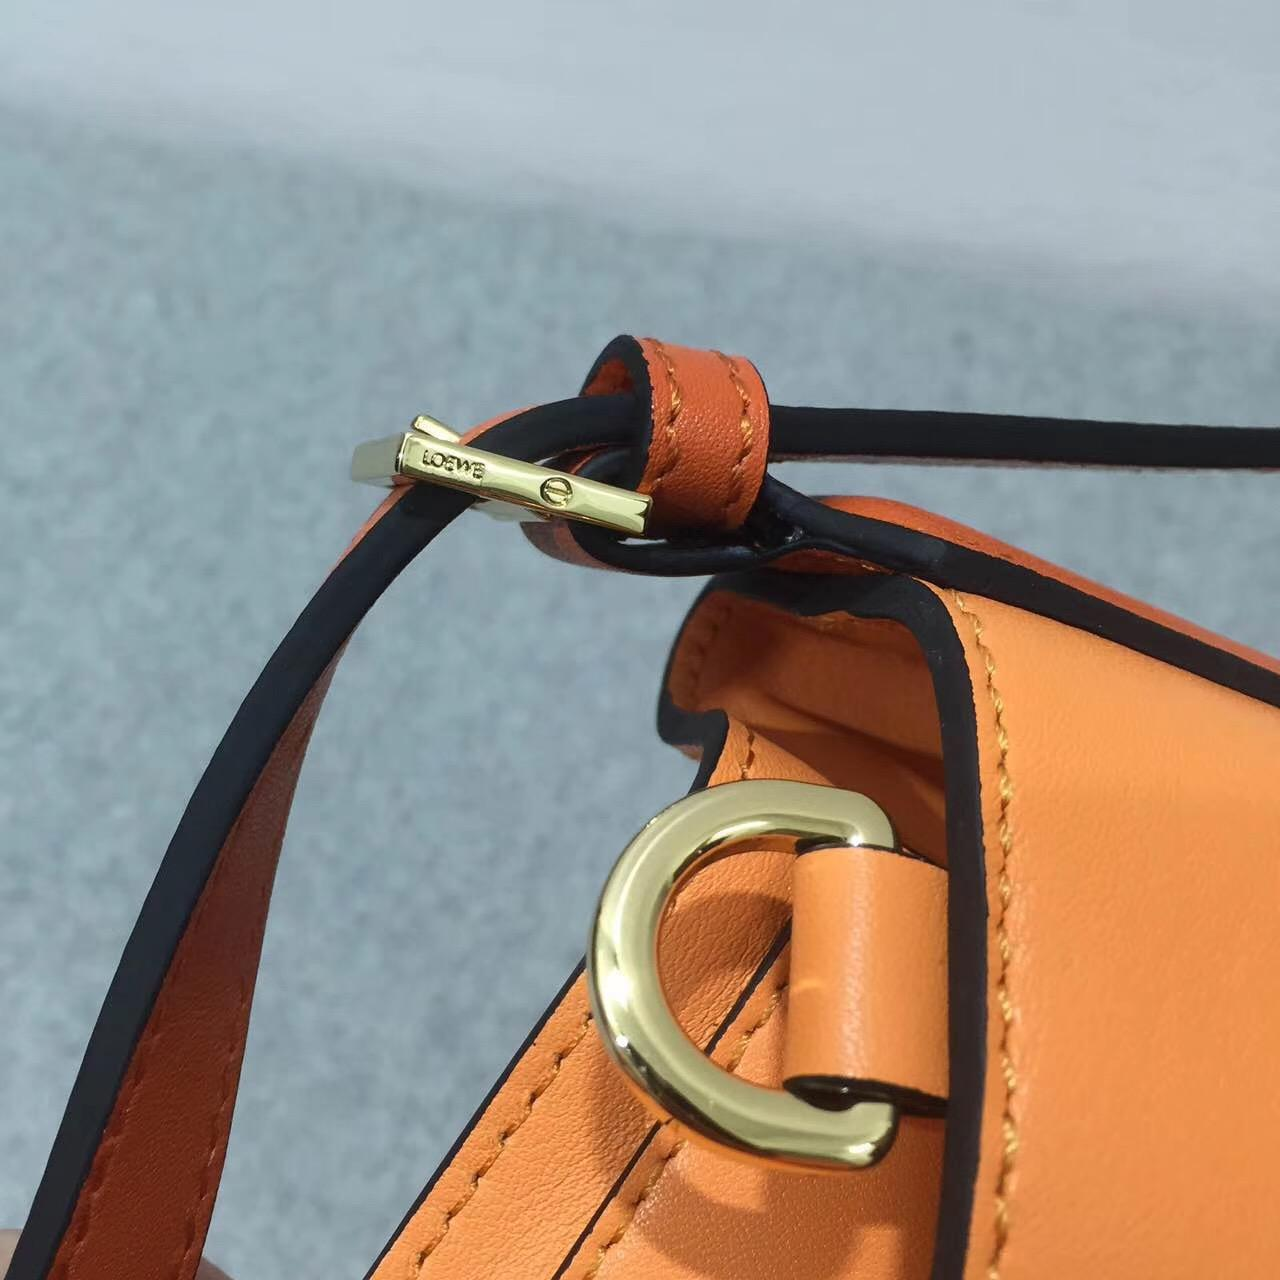 Loewe羅意威Midnight Bag Apricot/Orange Midnight水桶包手袋